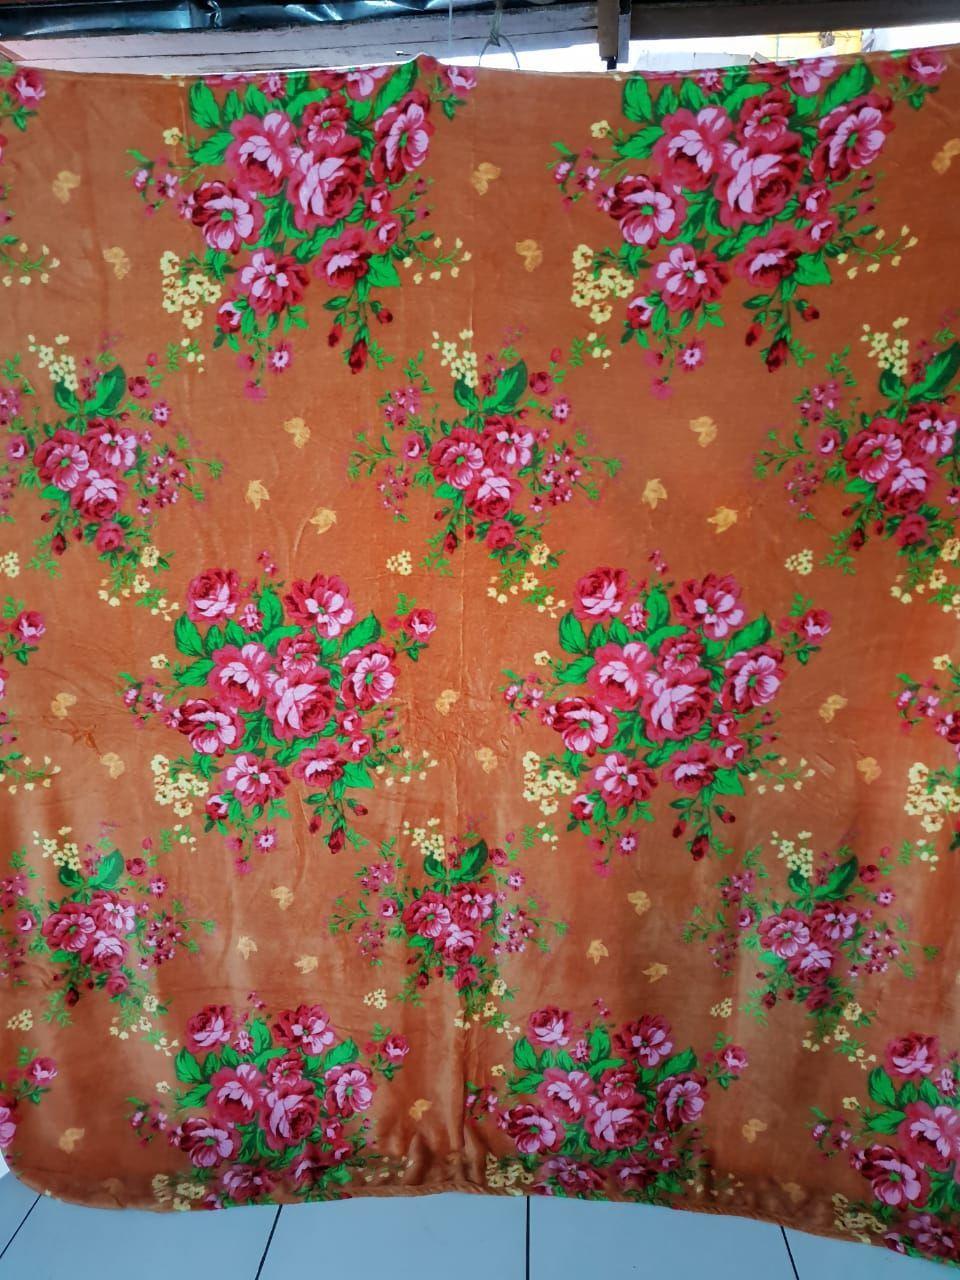 Buy Sell Cheapest Merak Bulu 180x180 Best Quality Product Deals Selimut Dewasa 180x200 White Flower Uk 180 X 200 Cm